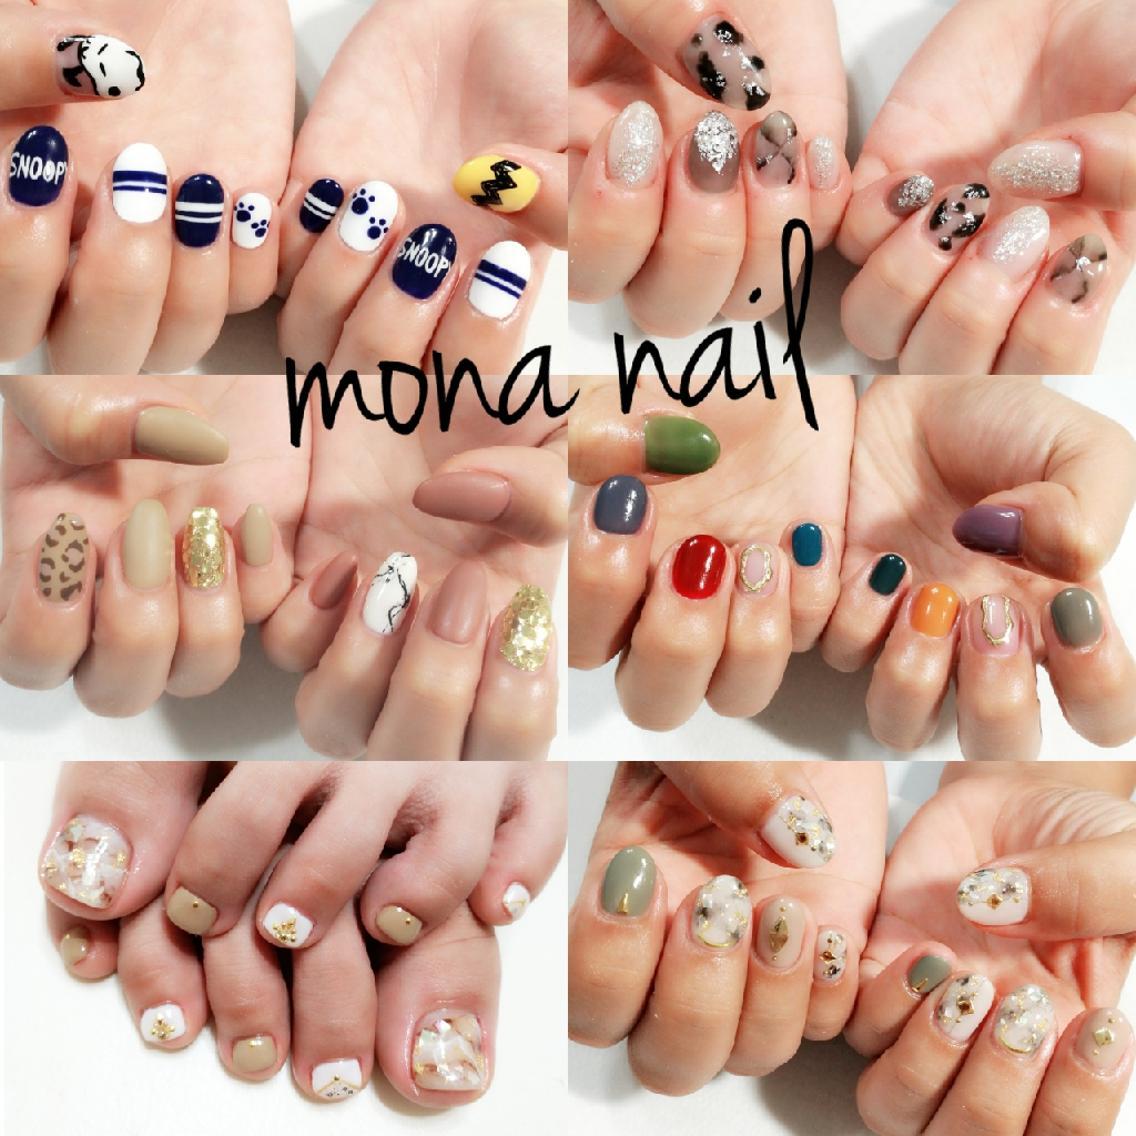 mona nail所属・mona nailの掲載